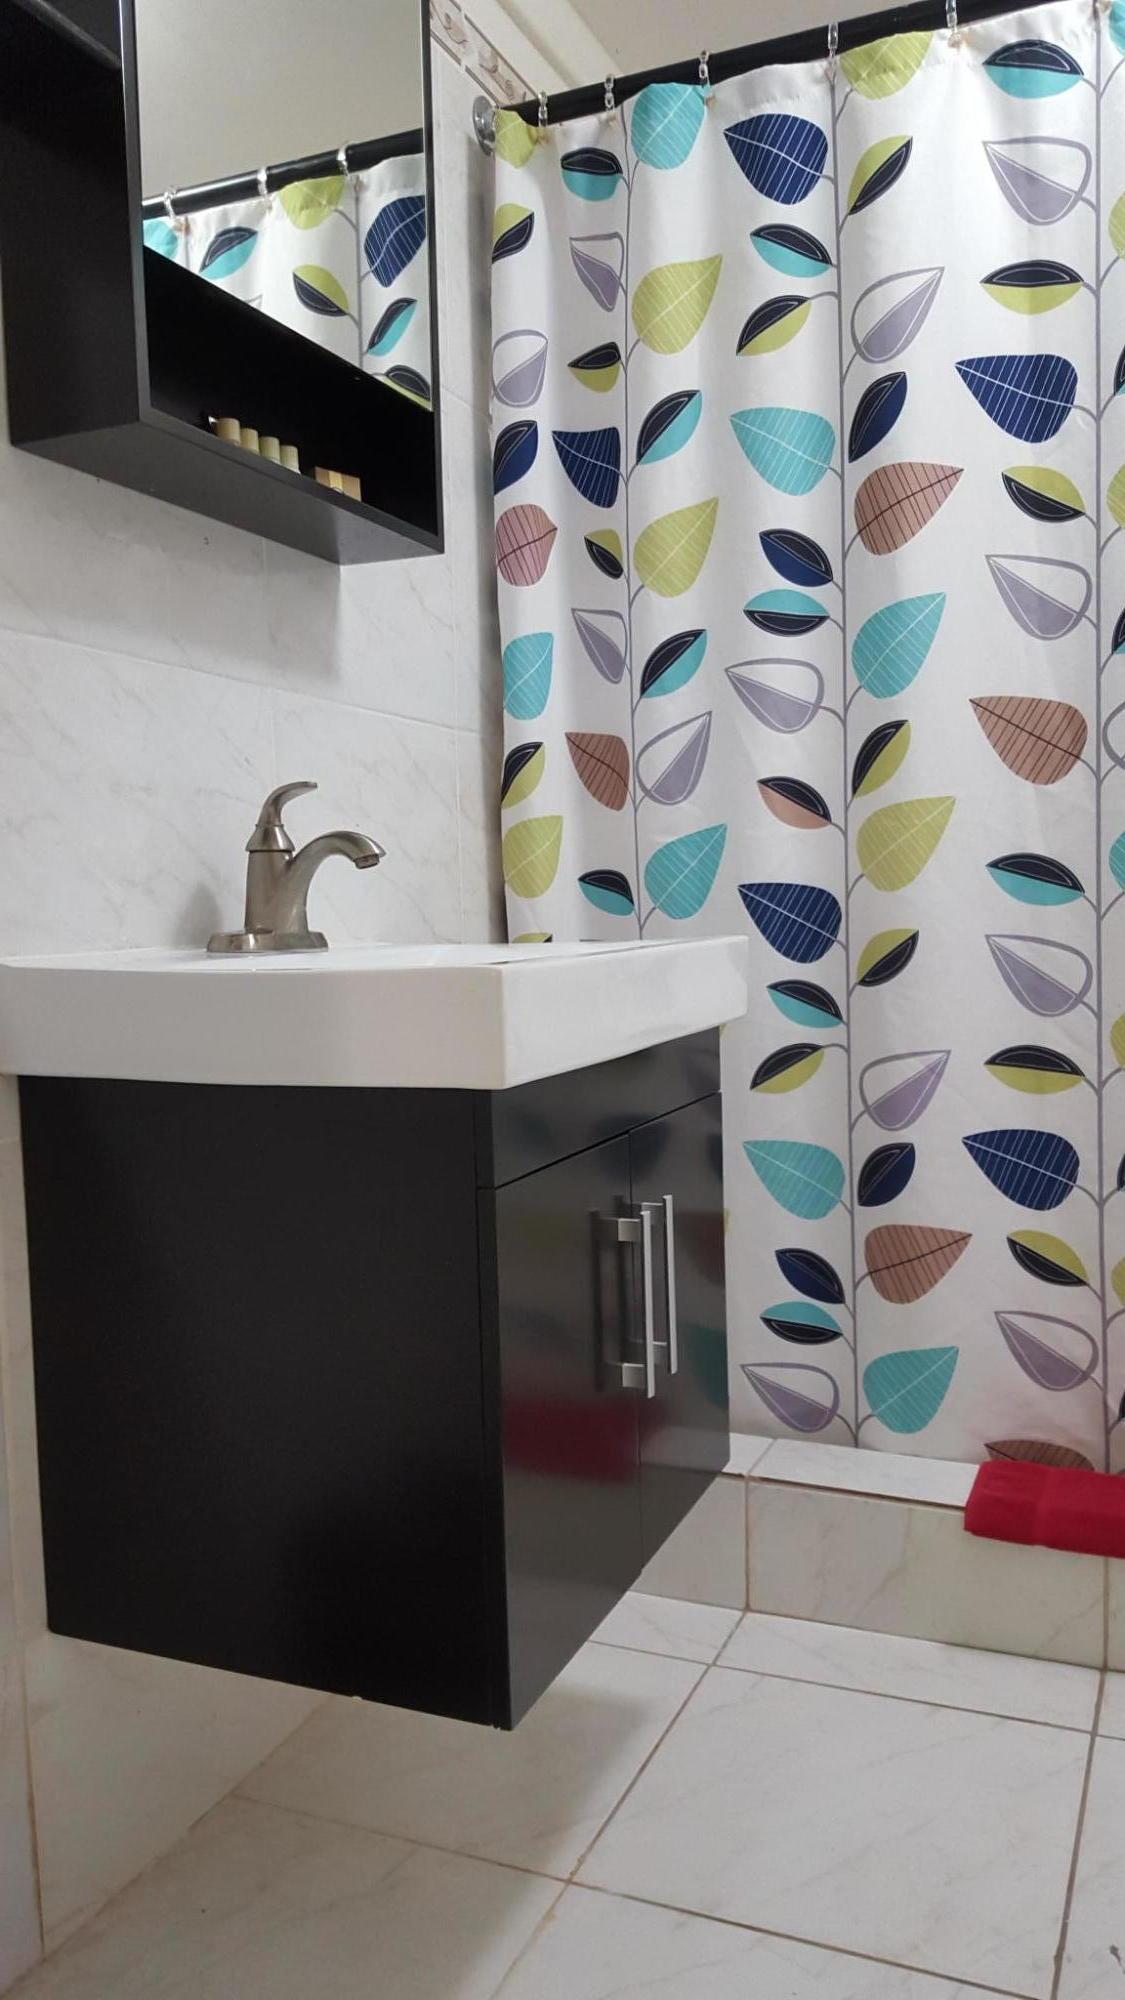 005 Updated bathrooms